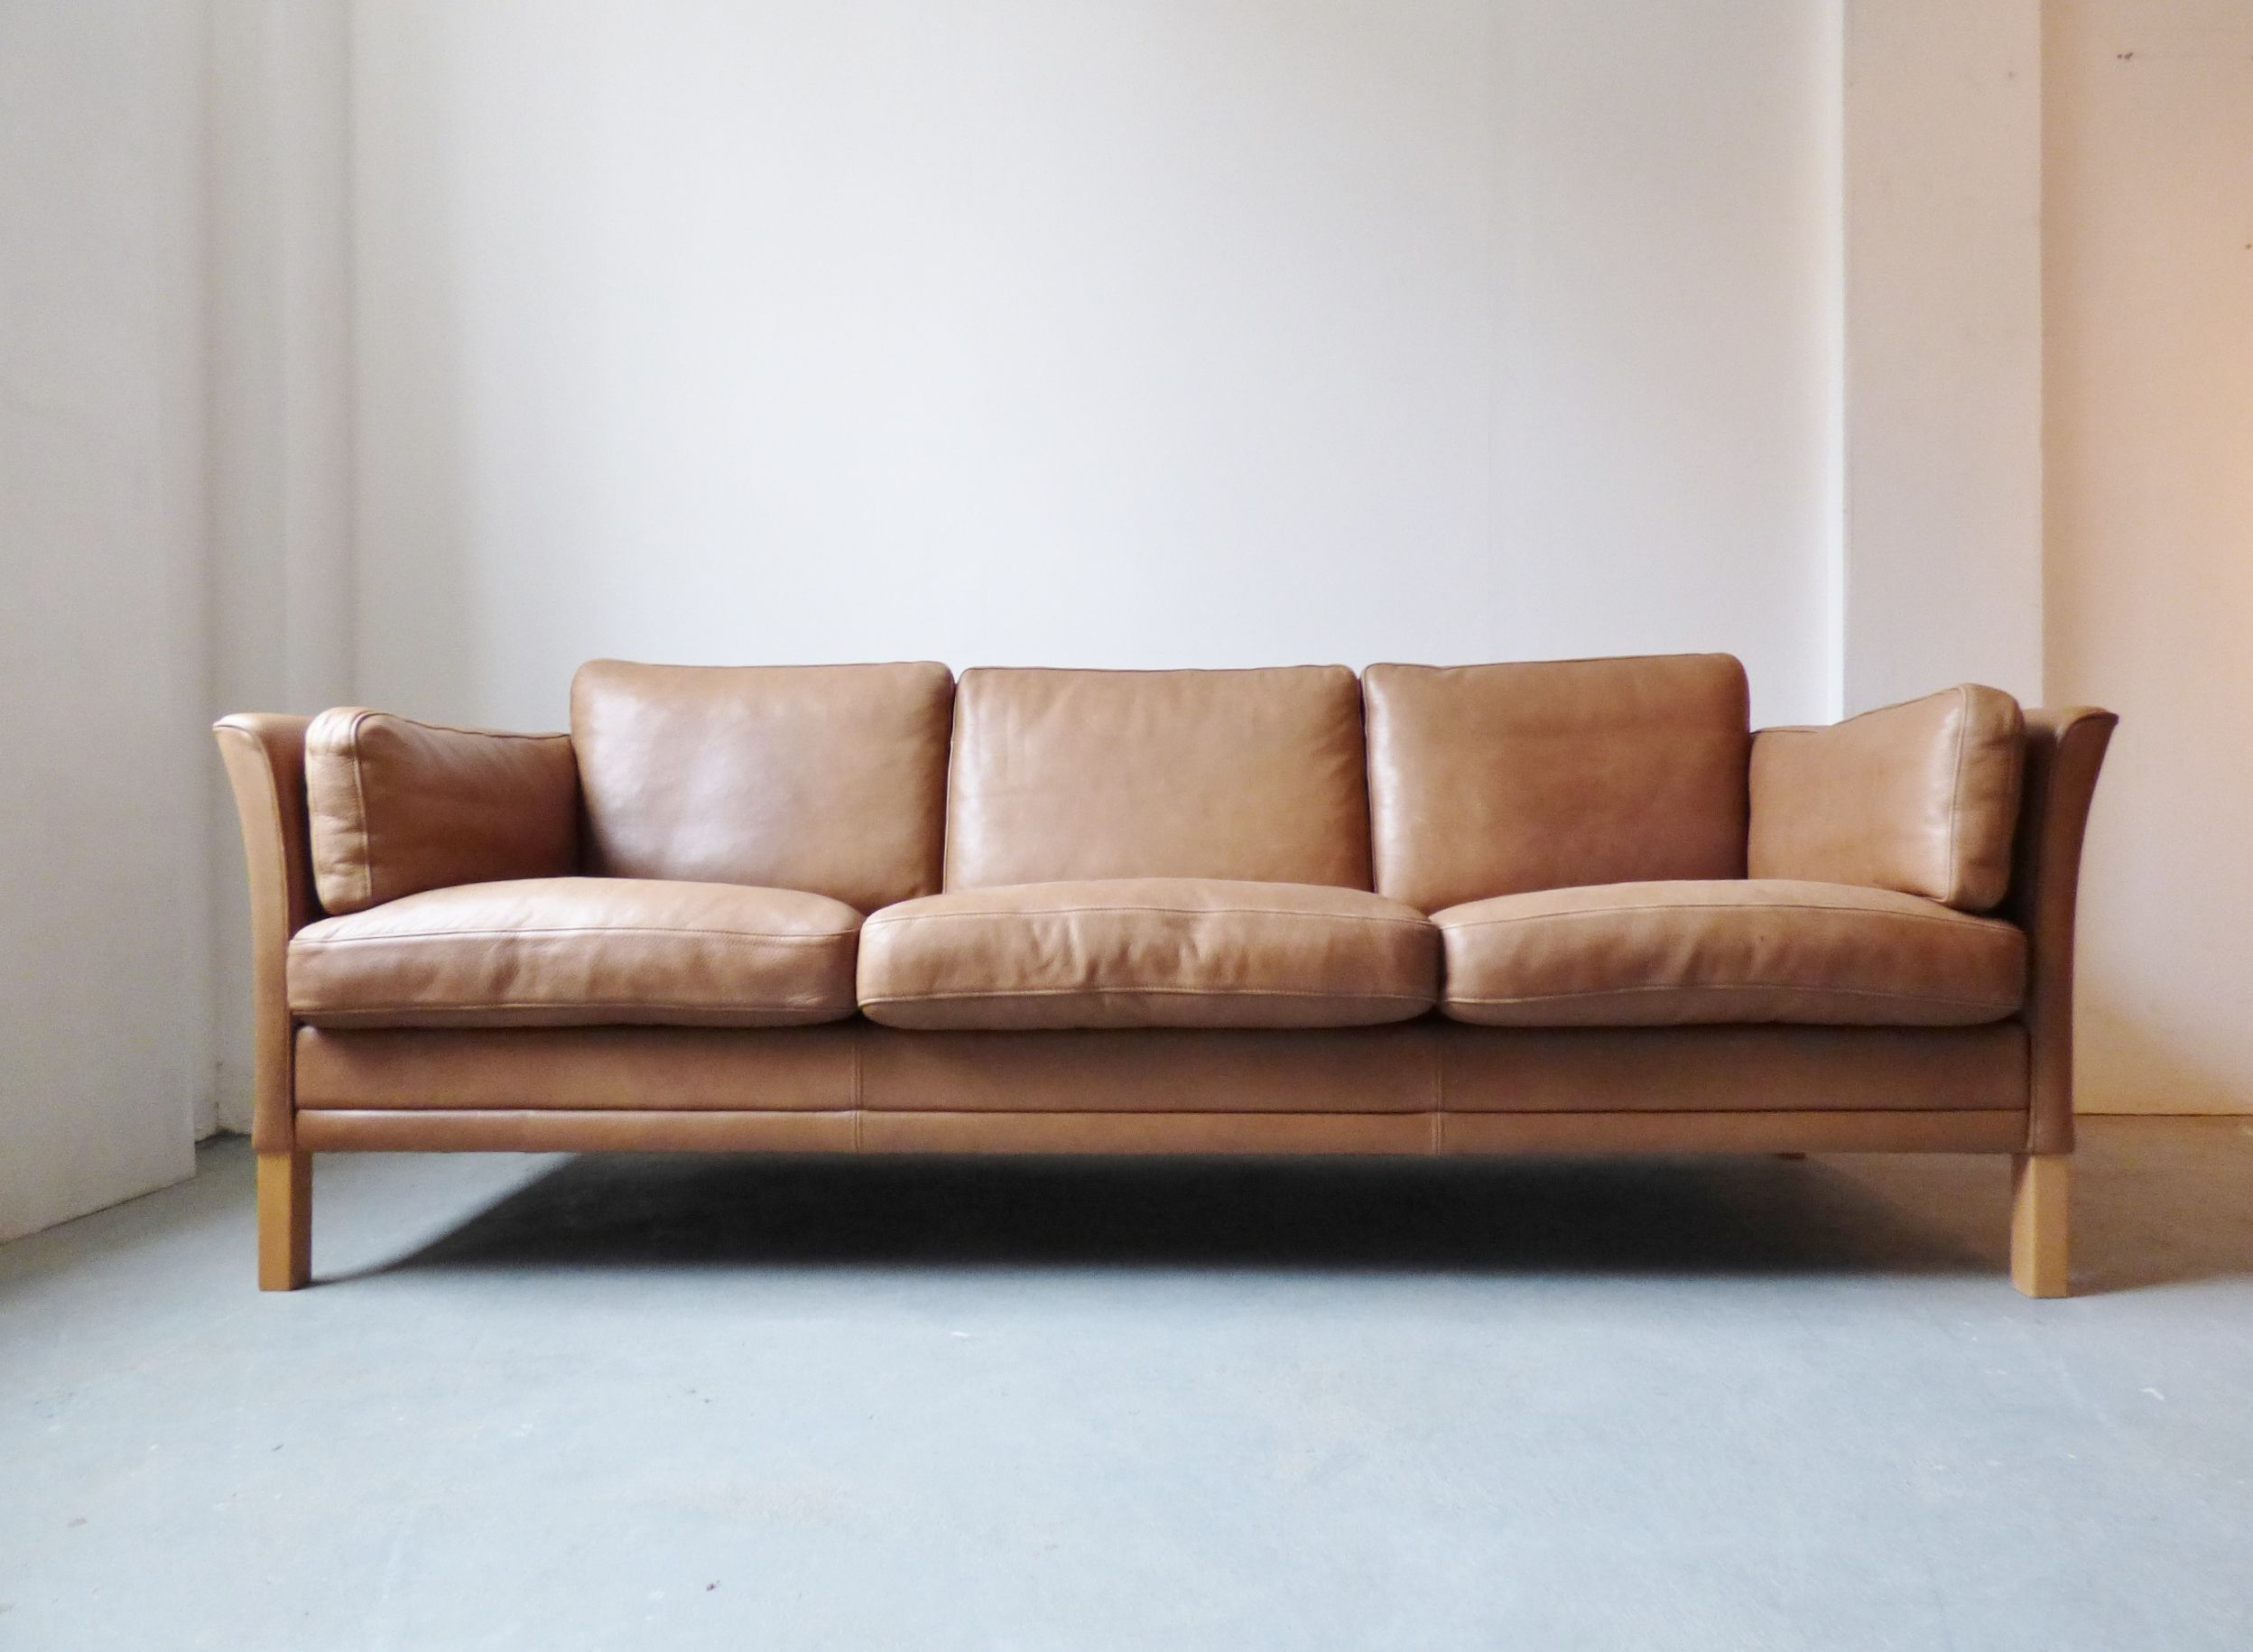 Vintage Danish Tan Leather 3 Seater Sofa Brown Leather Sofa Tan